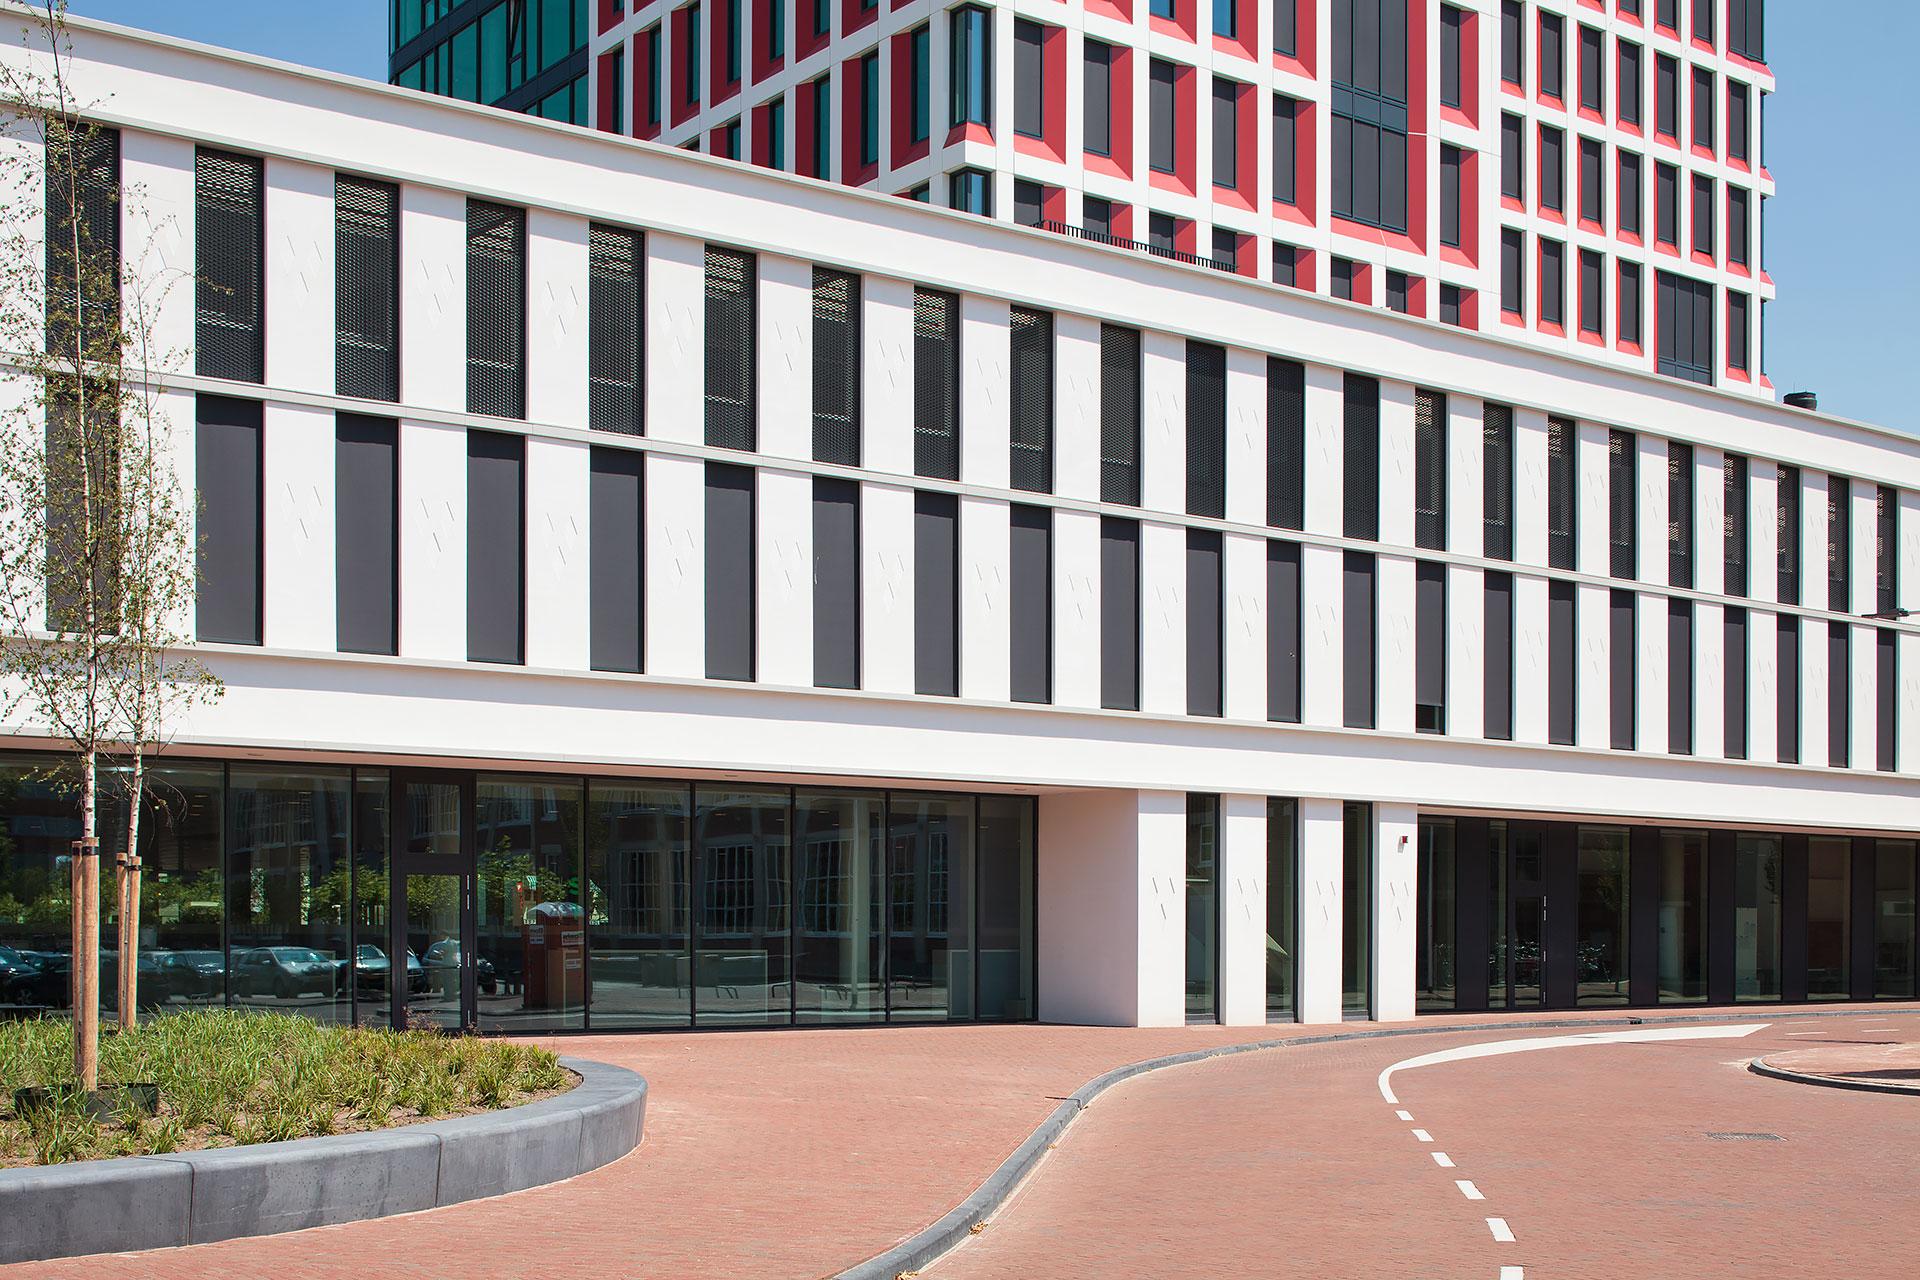 SP2015-Stadhuis-Almelo-architectuurfoto-05